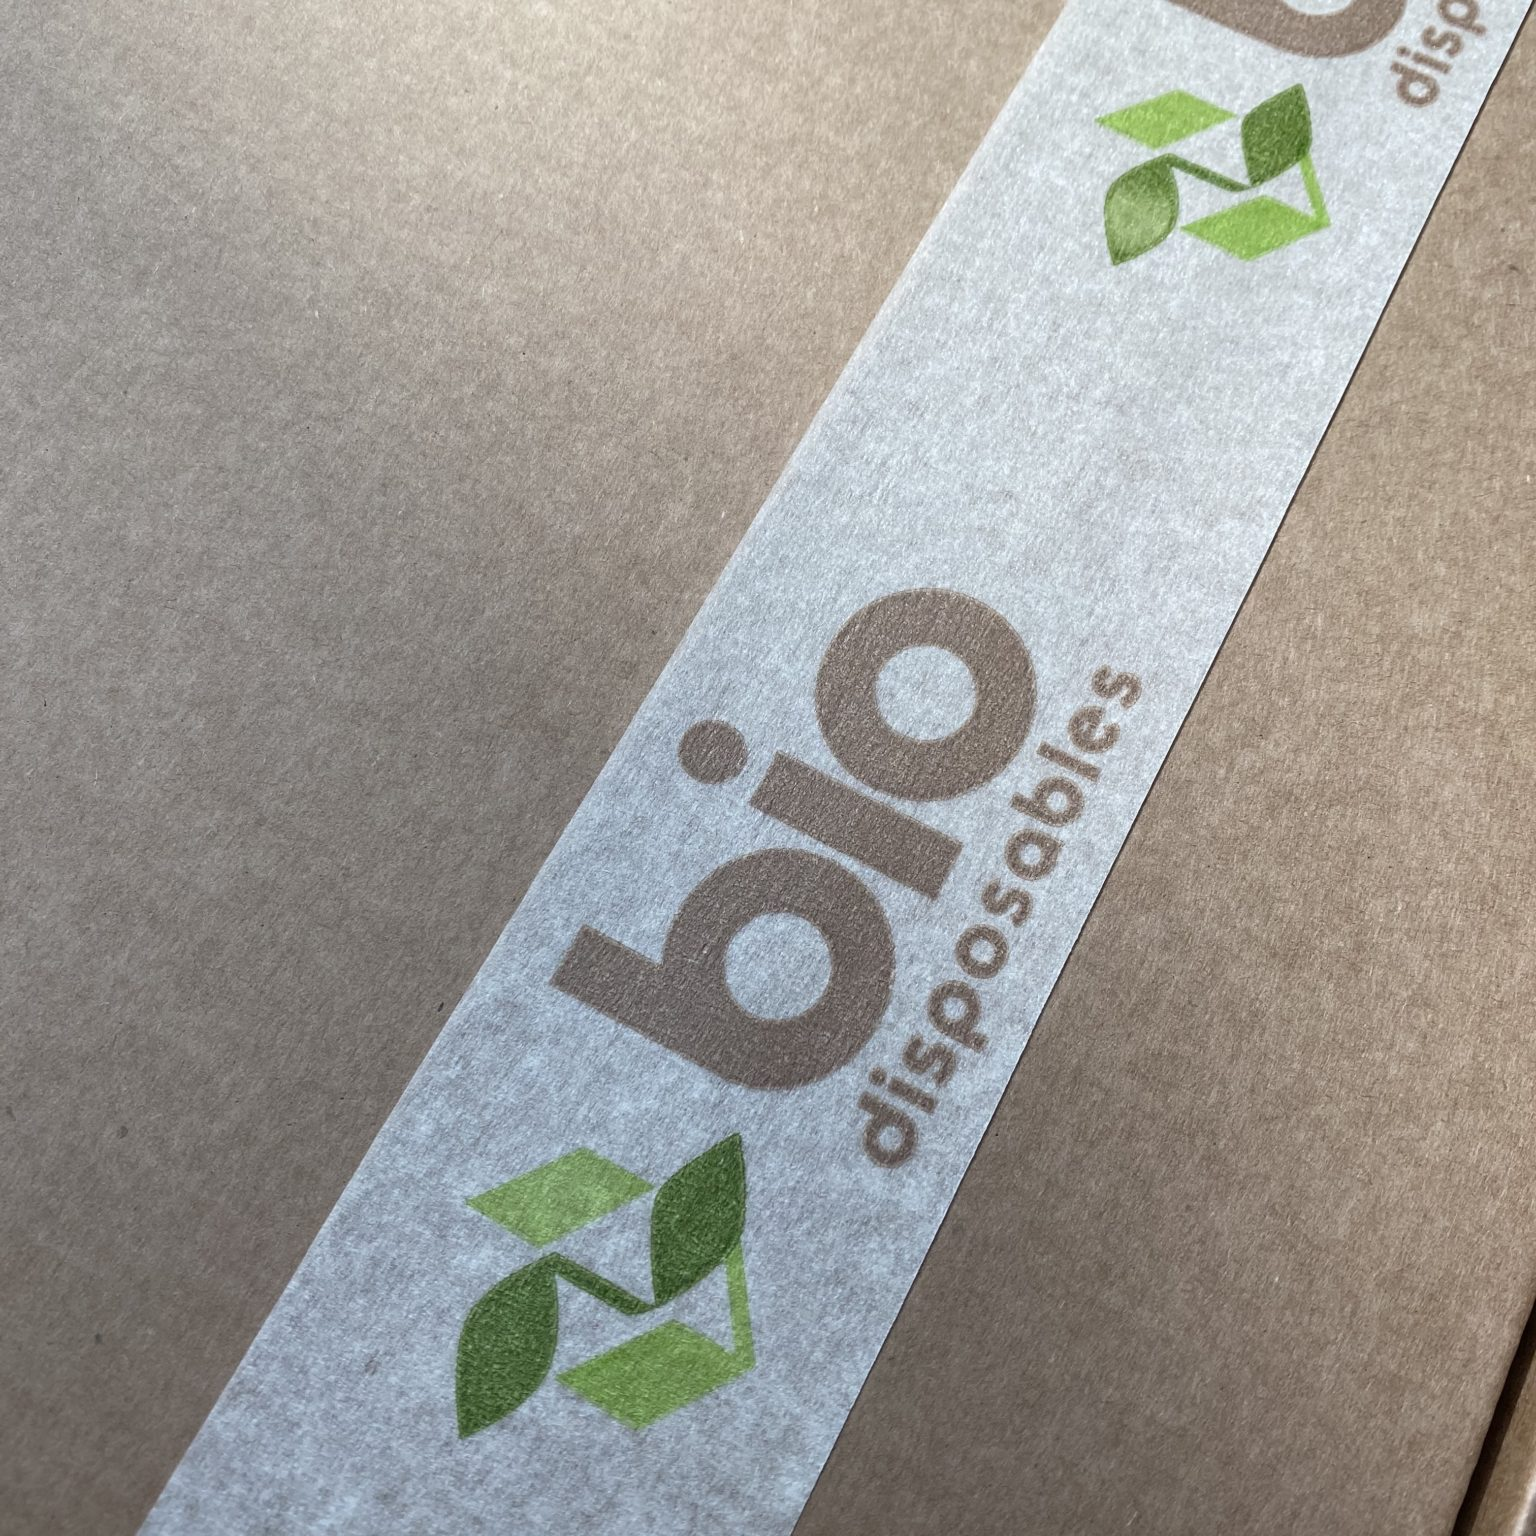 Sampledoos BIOdisposables